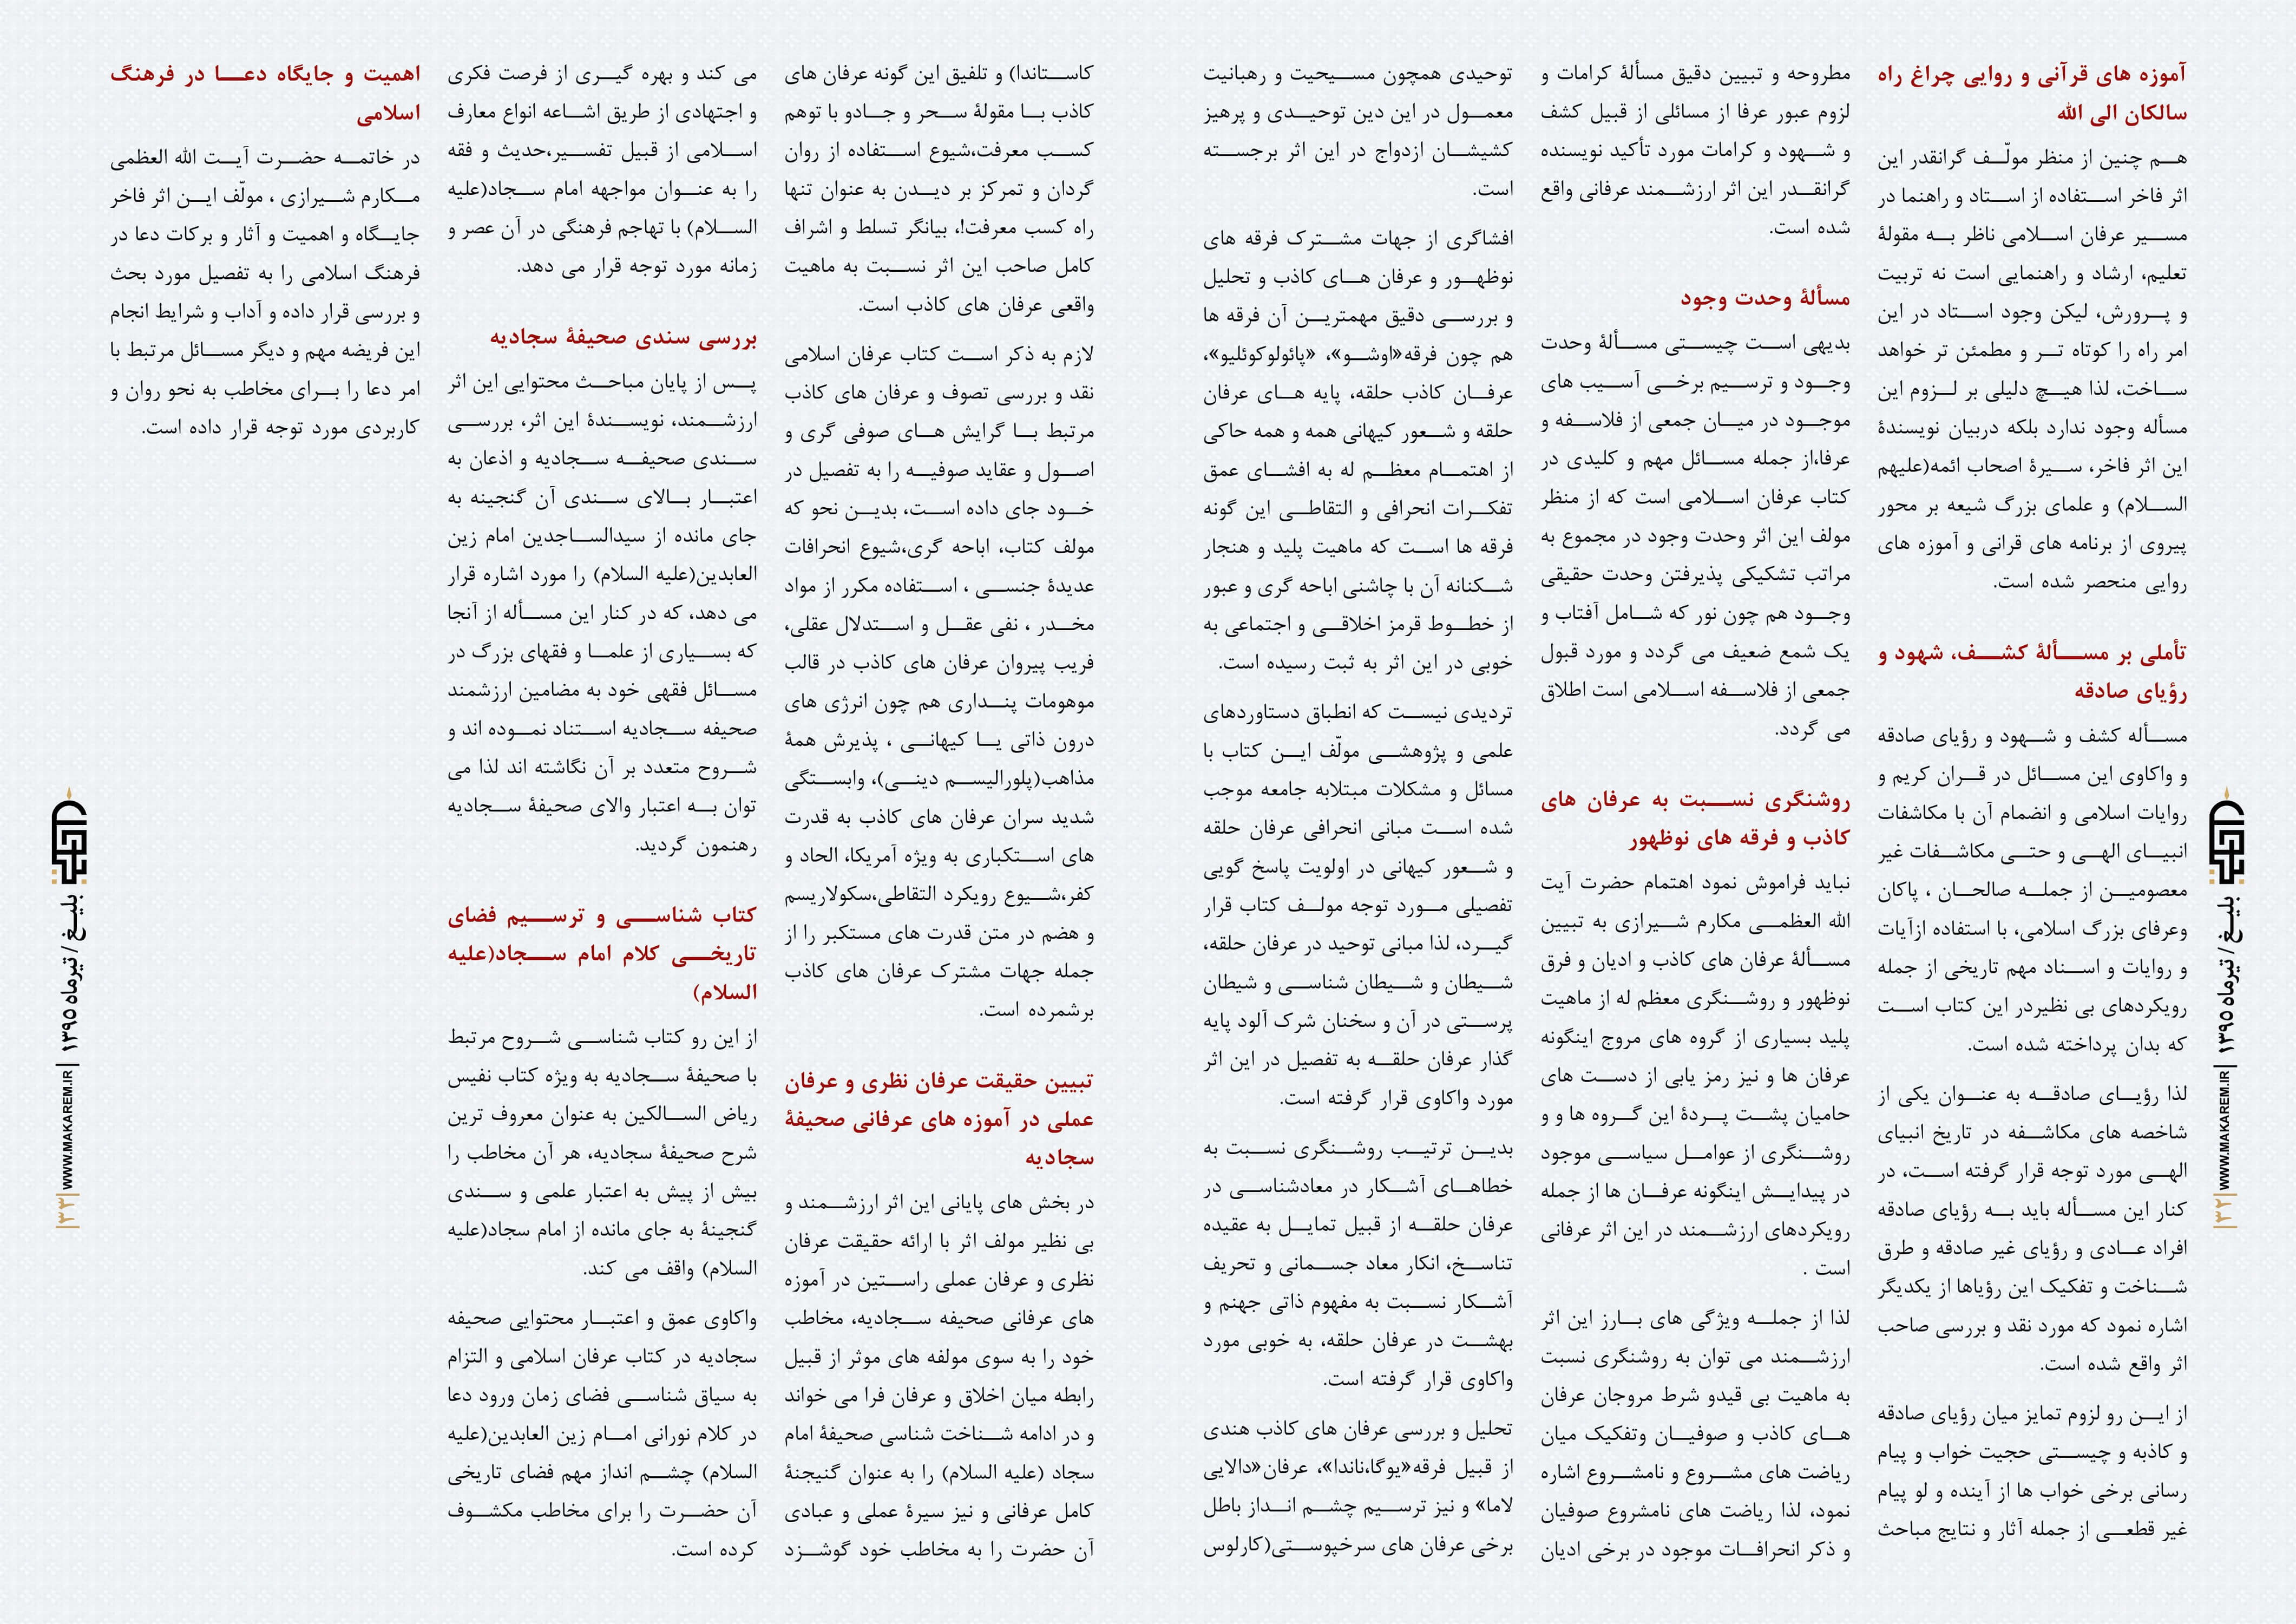 بلیغ 17-مدرسه الامام امیر المومنین (ع)